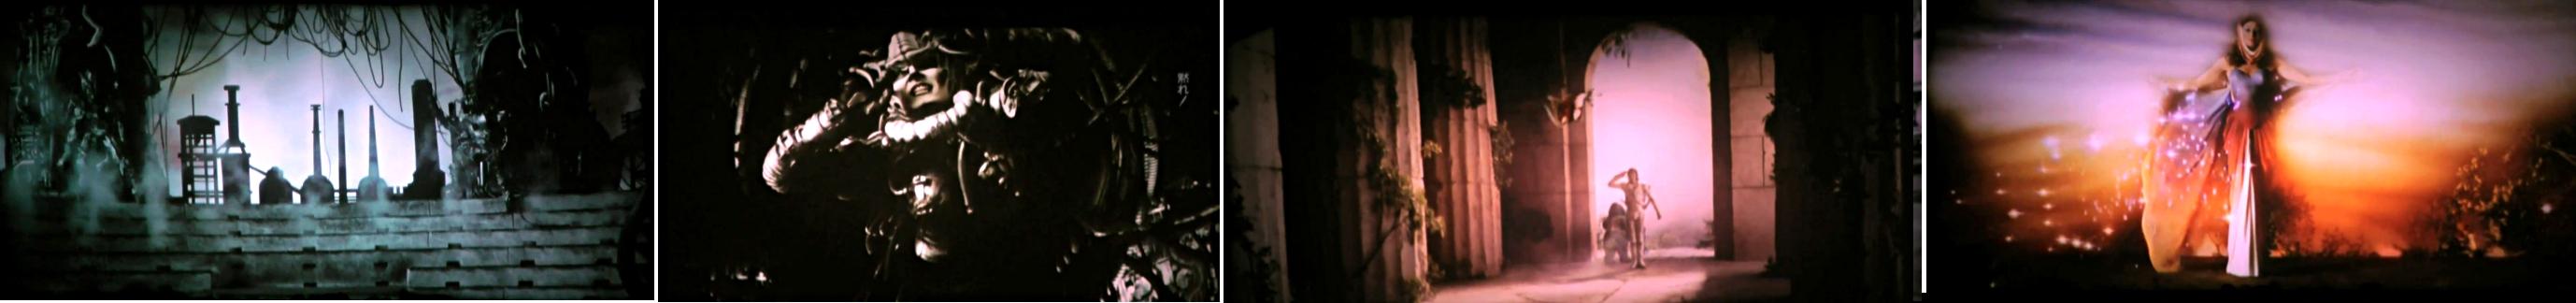 michael jackson dangerous album cover explained meaning erklärt symbols symbole bedeutung ryden art captain EO disney film